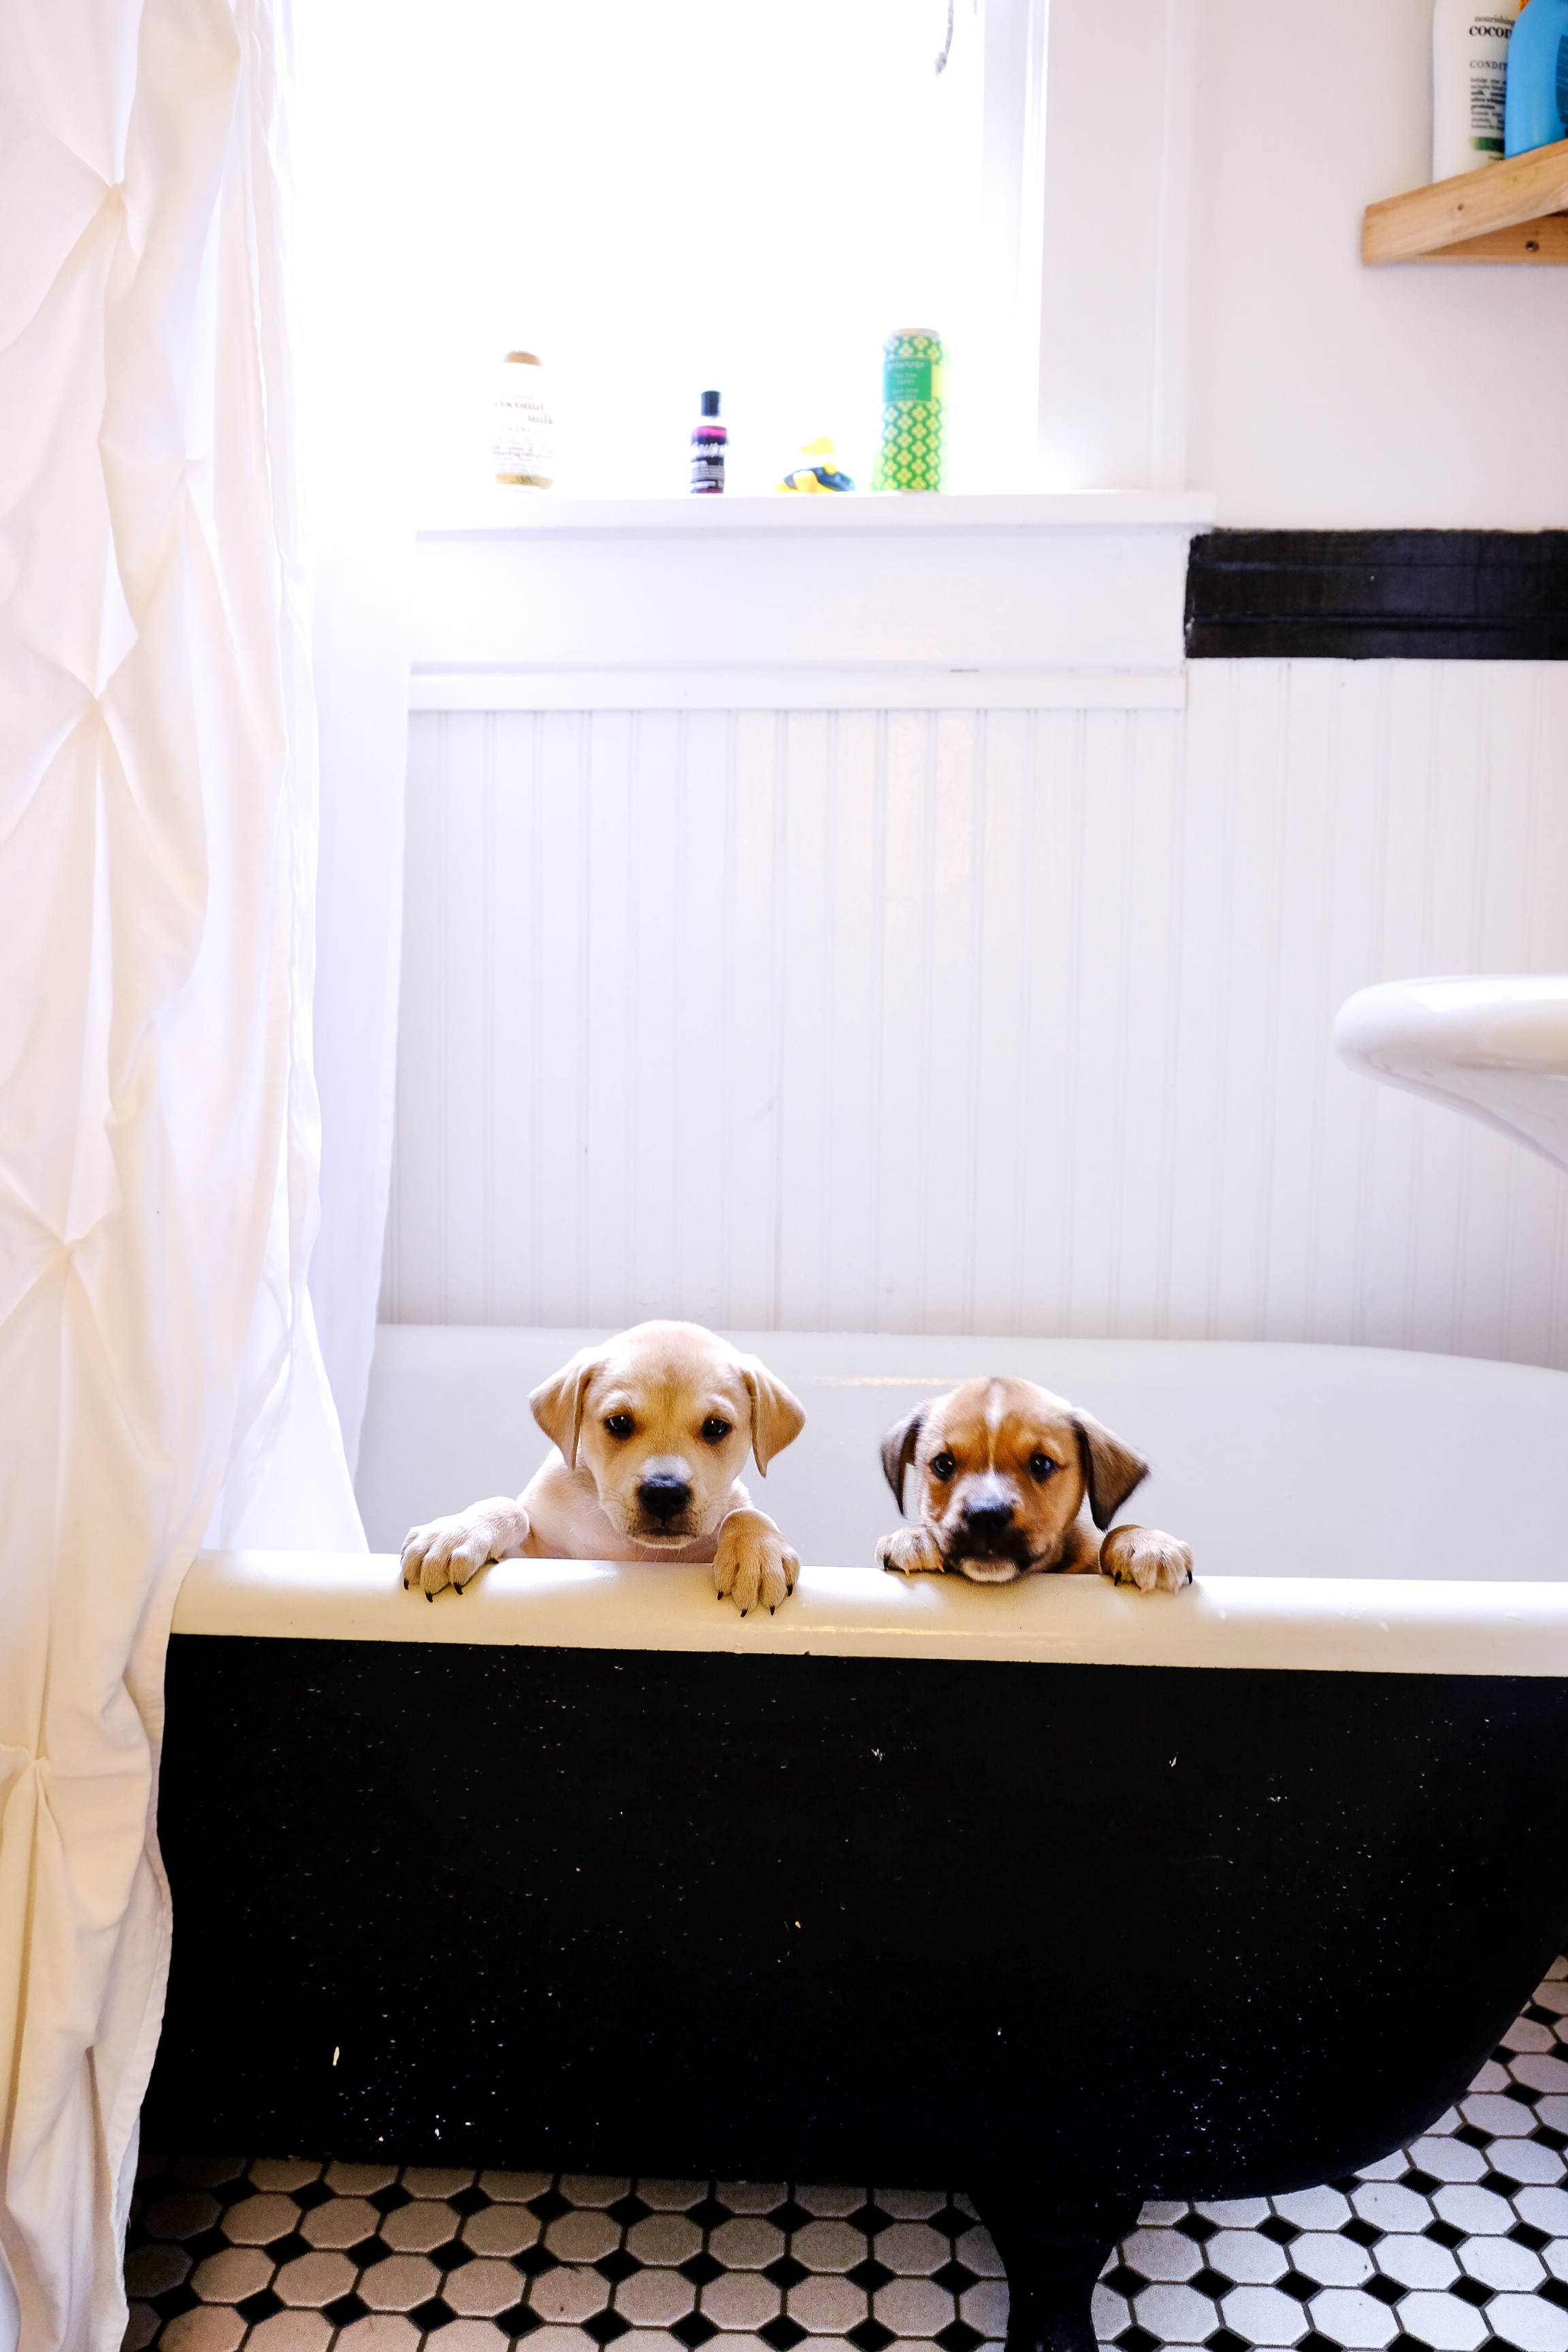 puppyinbath (1 of 1).jpg